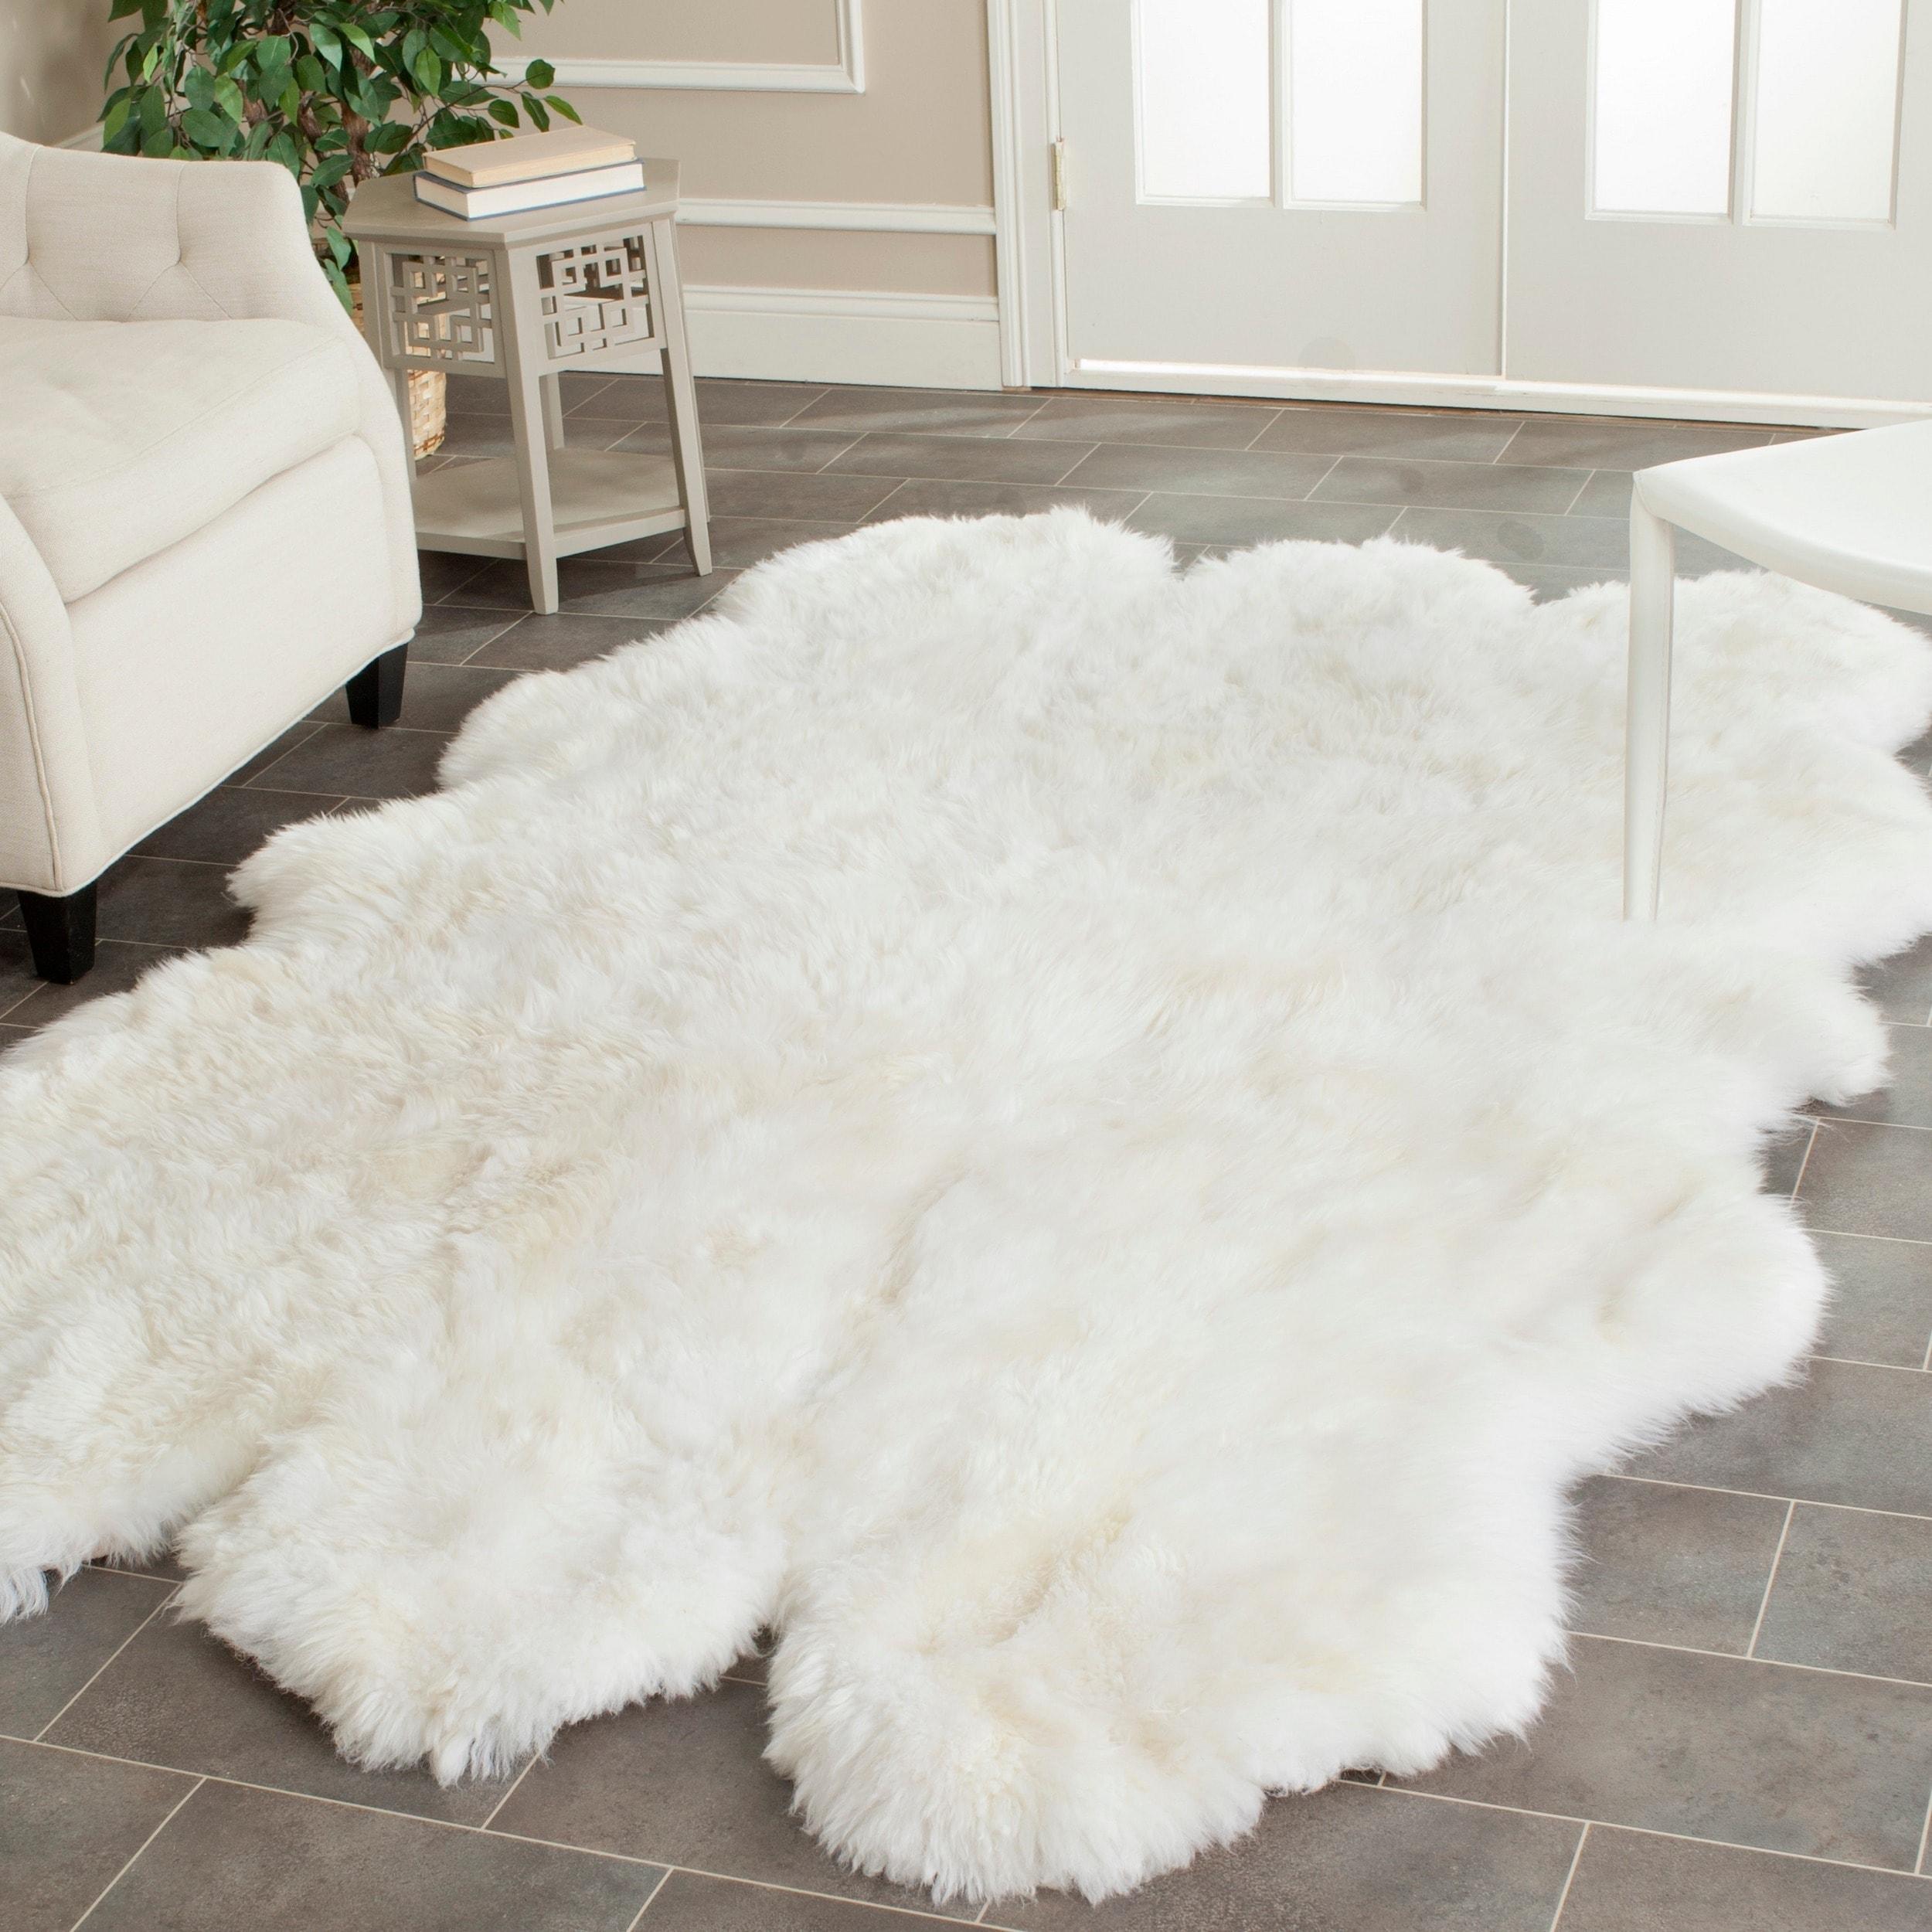 Safavieh Hand woven Sheepskin Pelt White Shag Rug